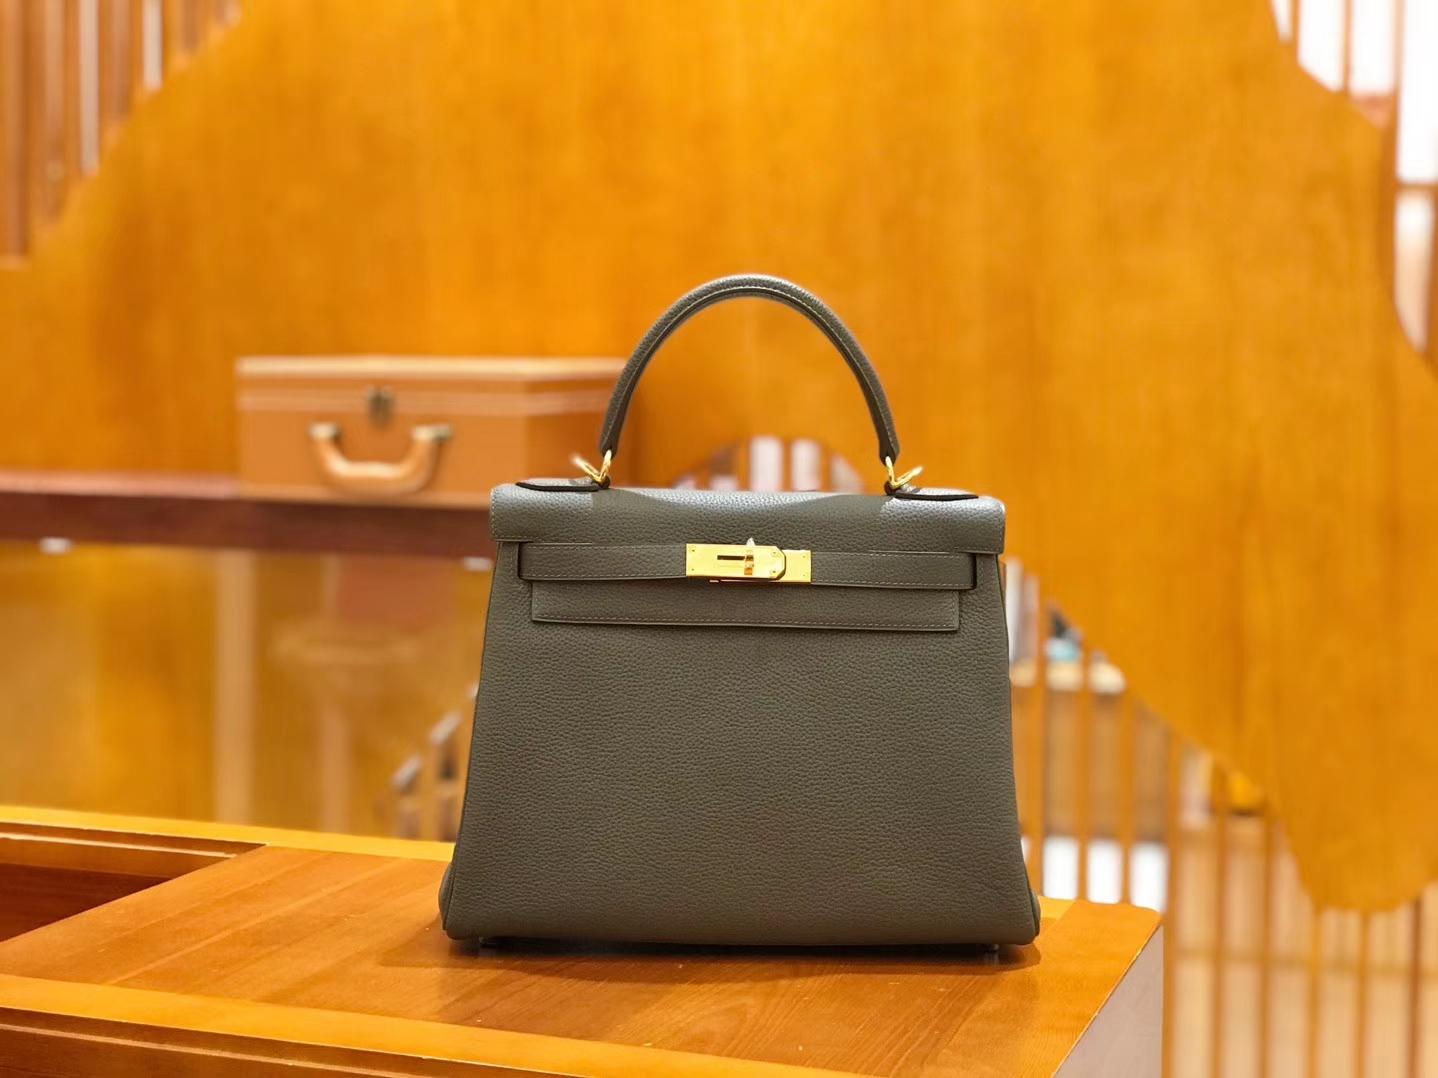 Hermès(爱马仕)Kelly 28cm togo 牛皮 锡器灰 金扣 全手工缝制 现货